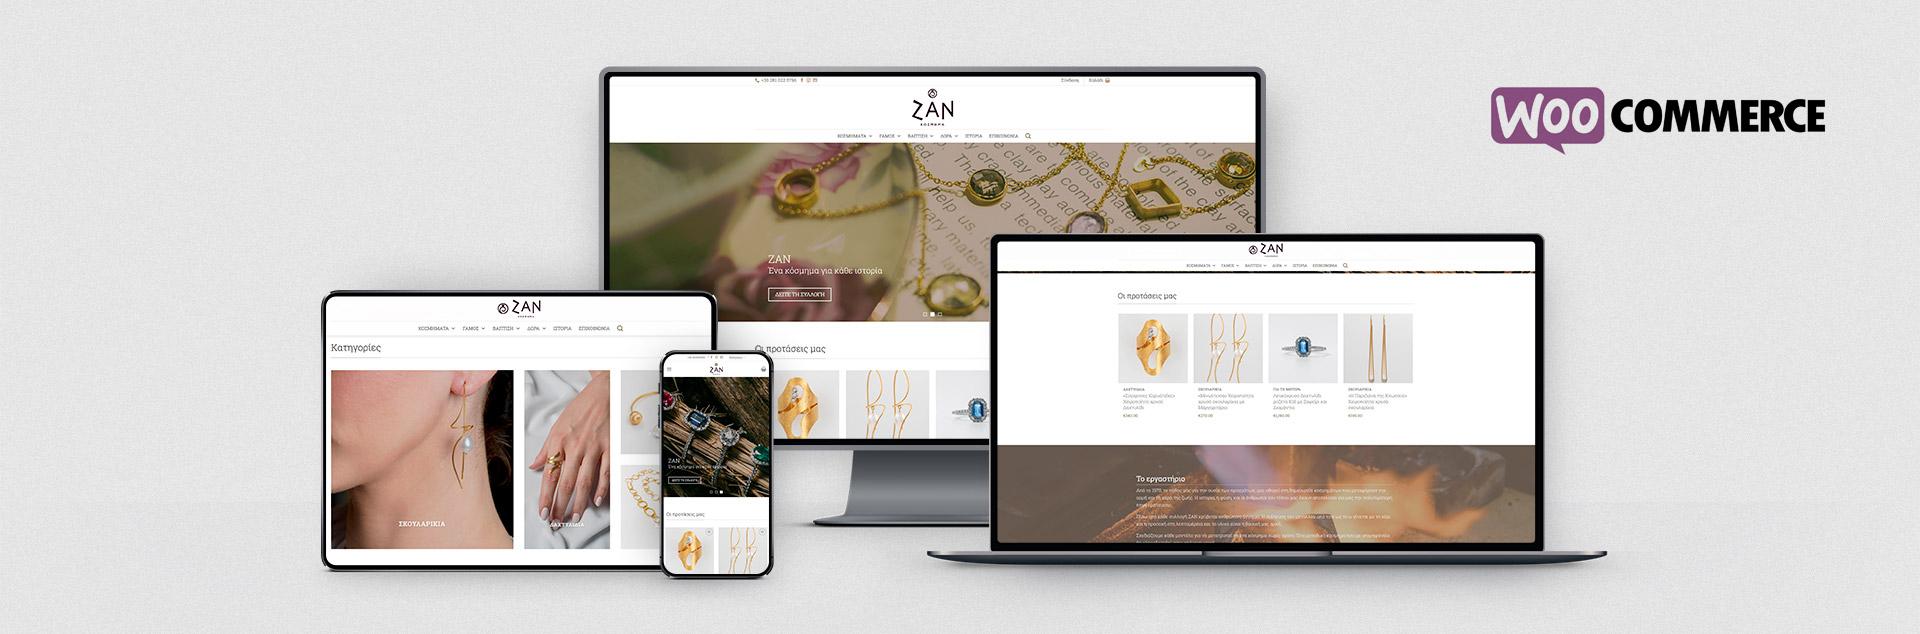 zan.com.gr